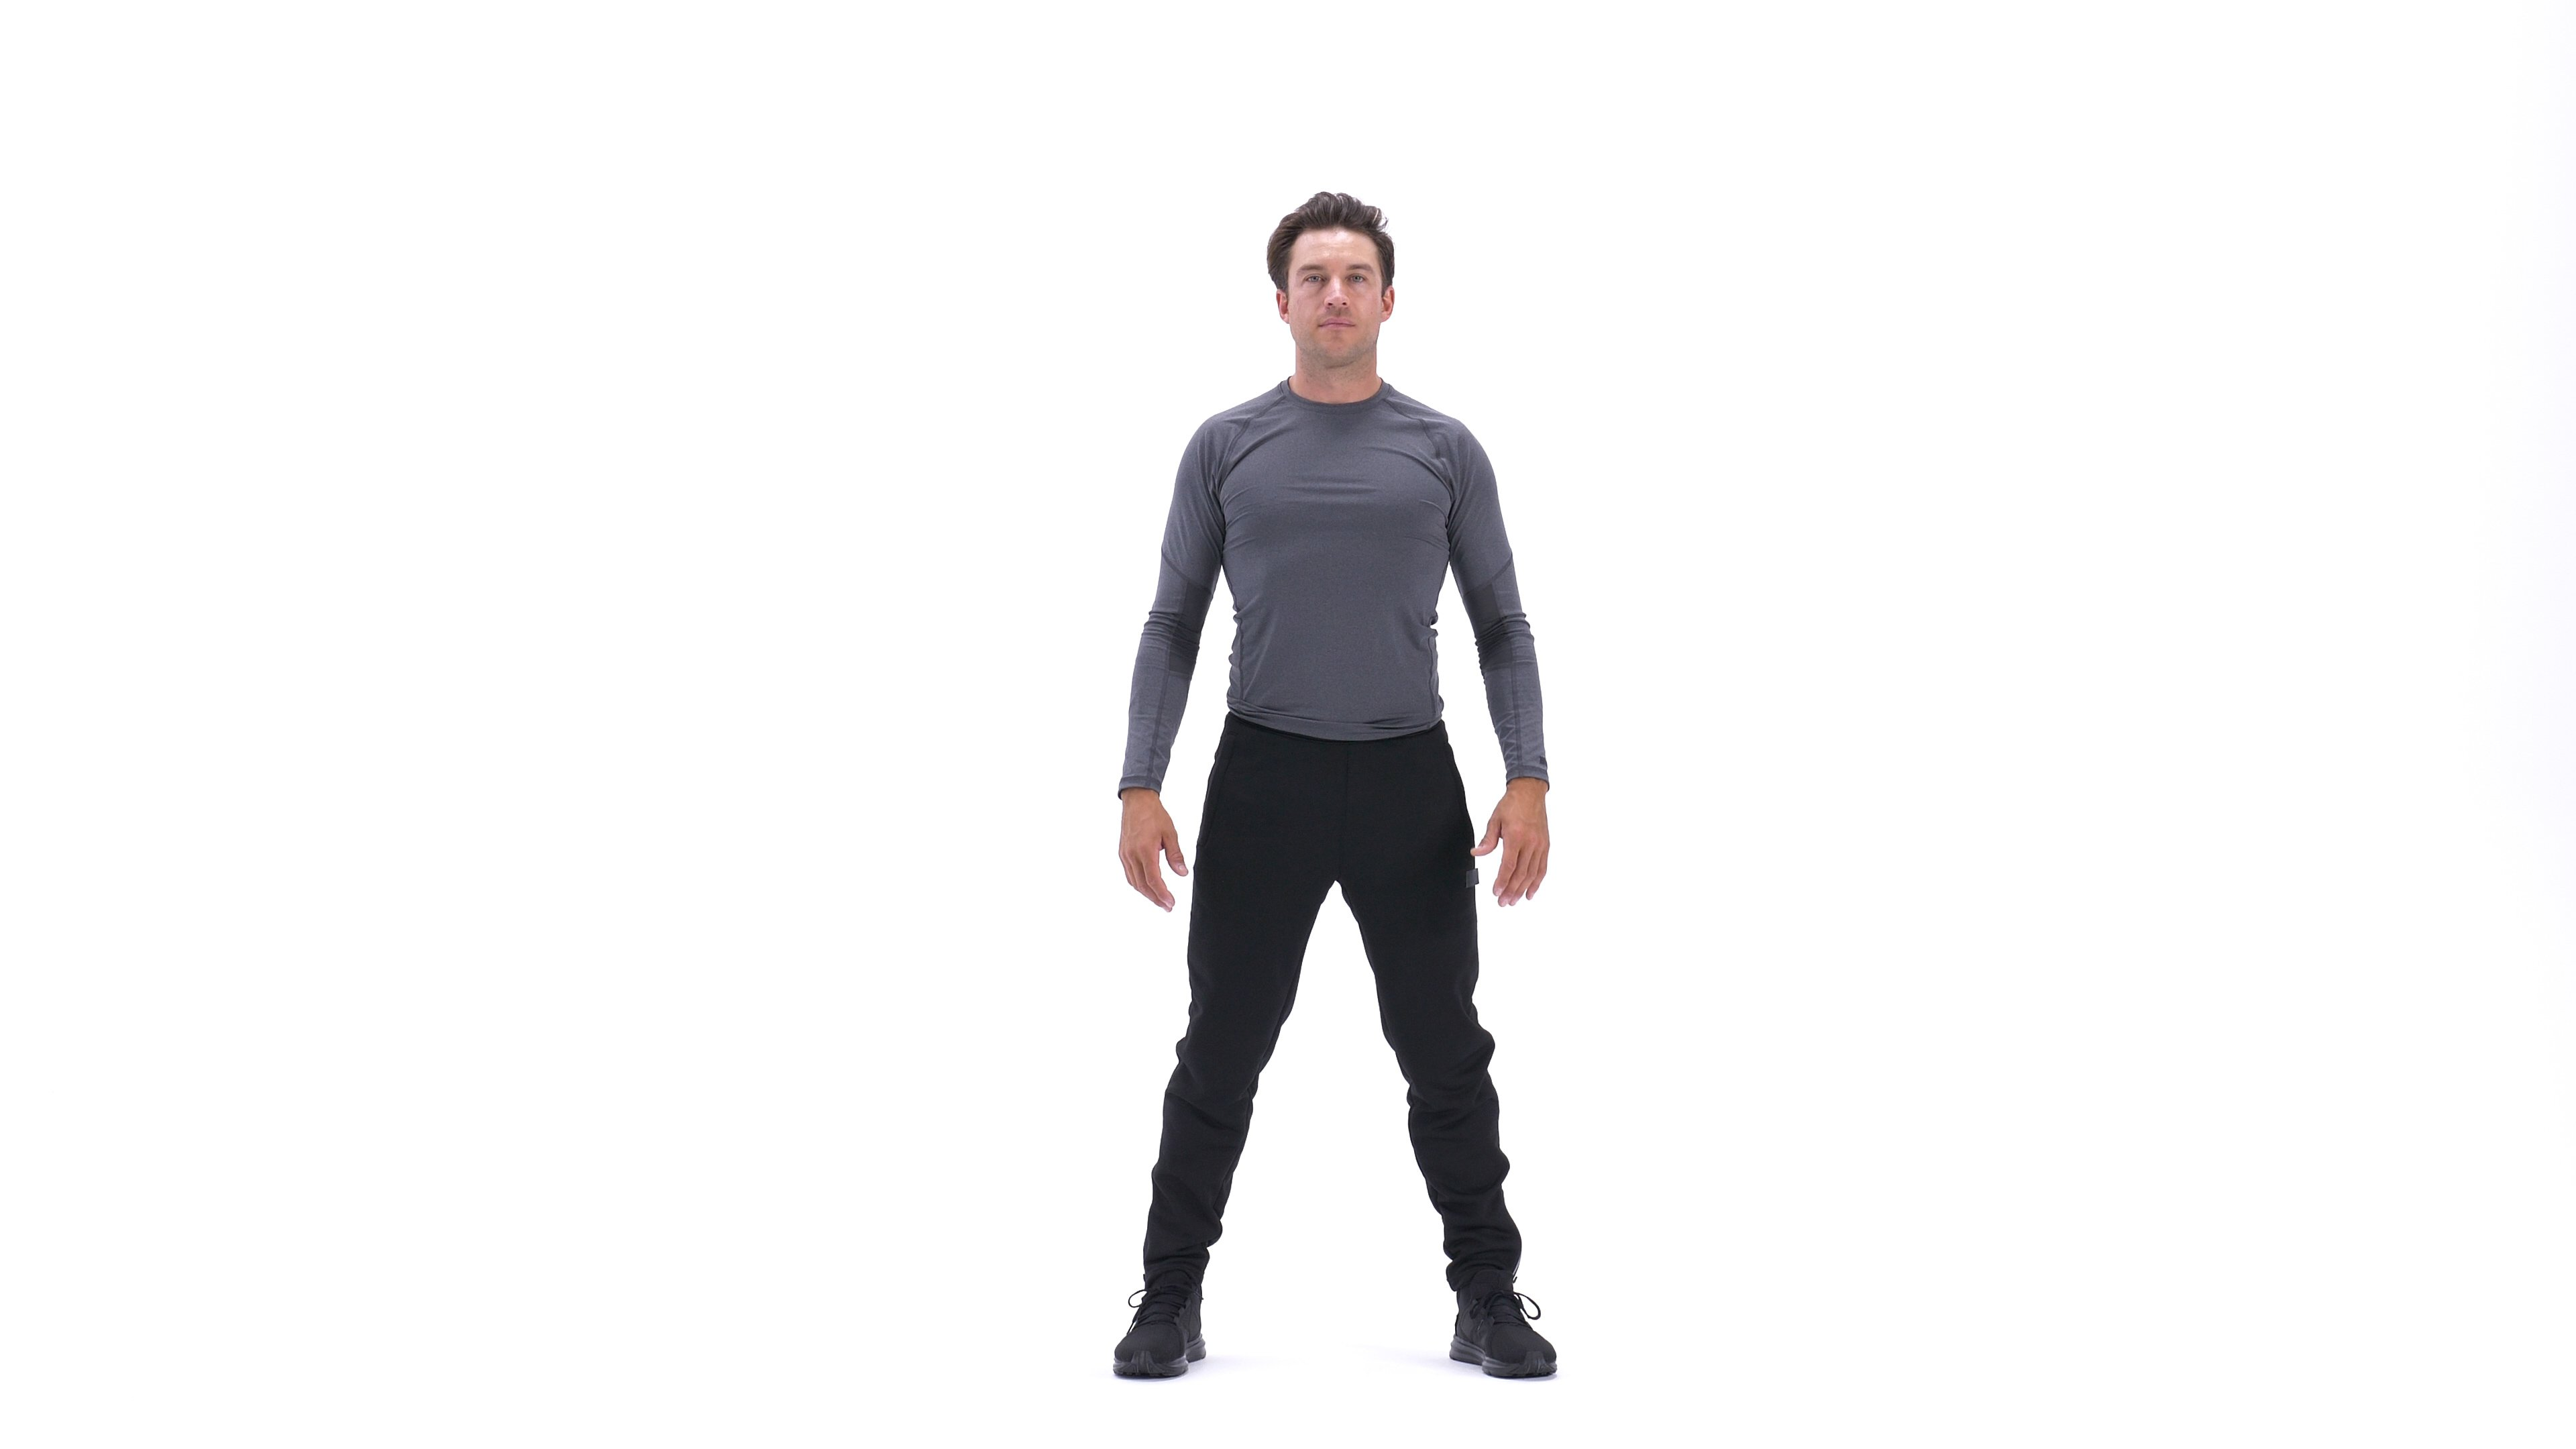 Bodyweight squat- image